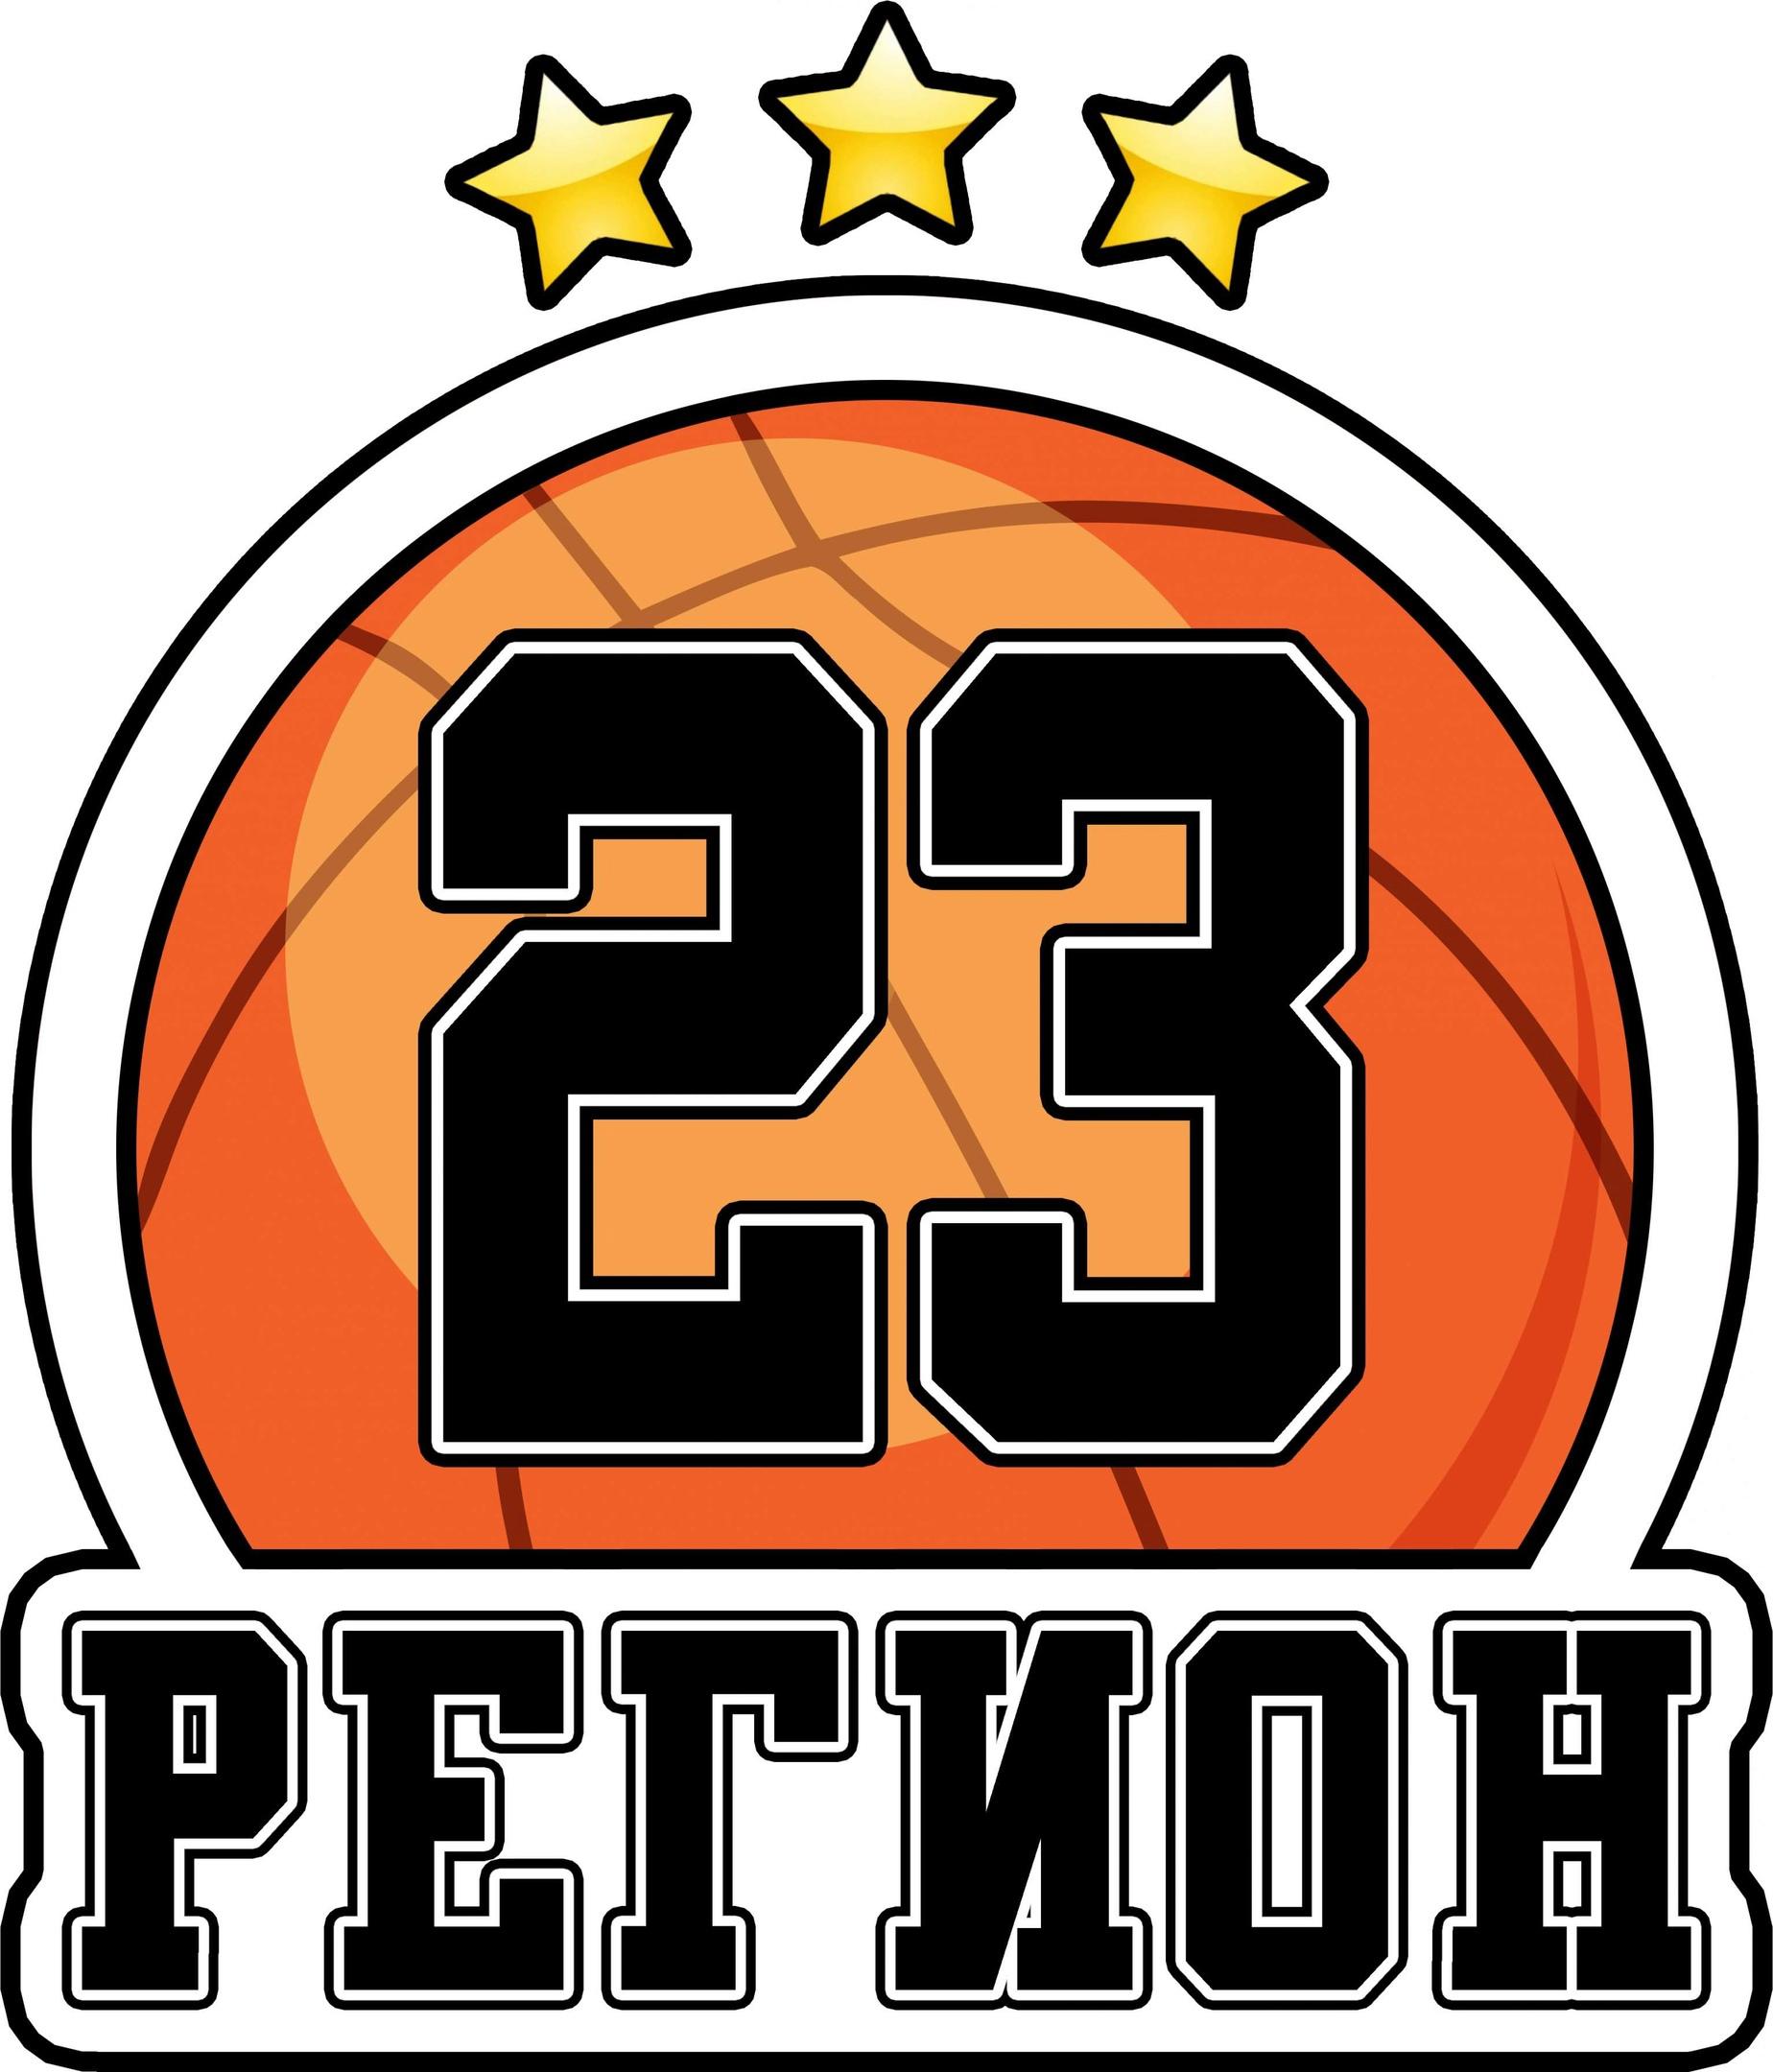 23 Регион